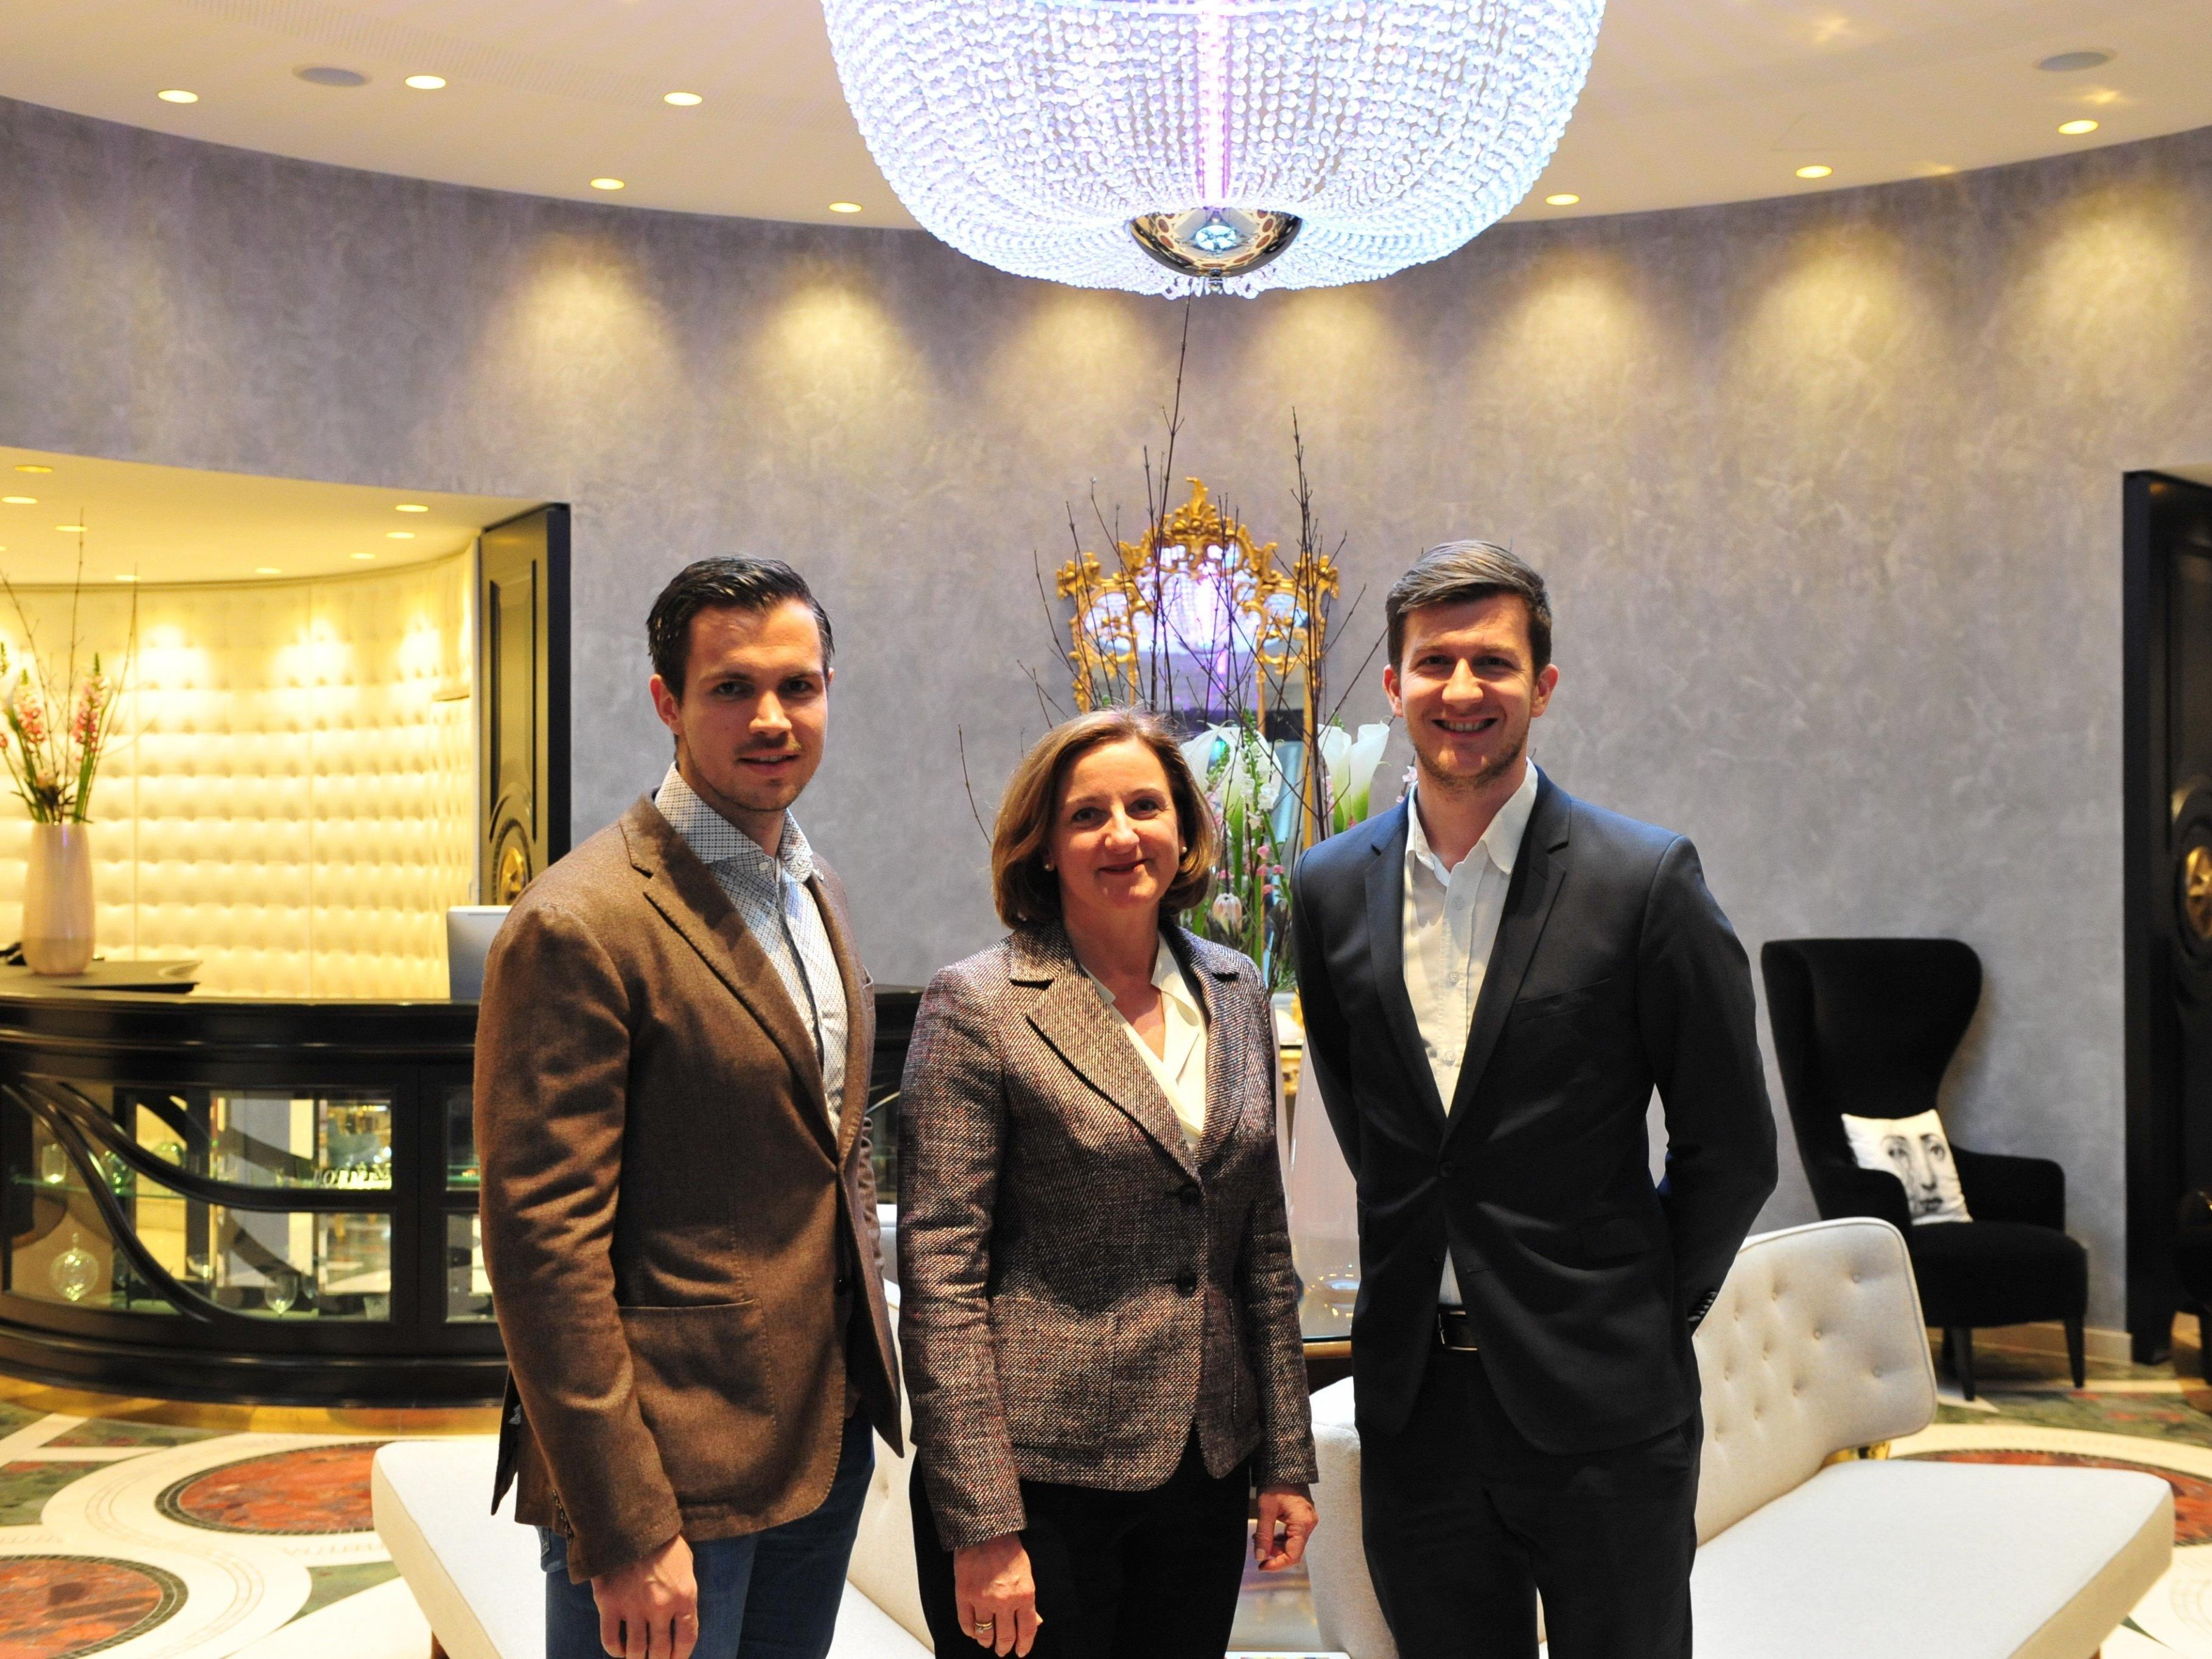 v.l.n.r.: Florian Wassel BA (Geschäftsführer TOWA), Andrea Fuchs (General Manager, Sans Souci), Peter Fetz MA (Marketing Manager, Sans Souci).